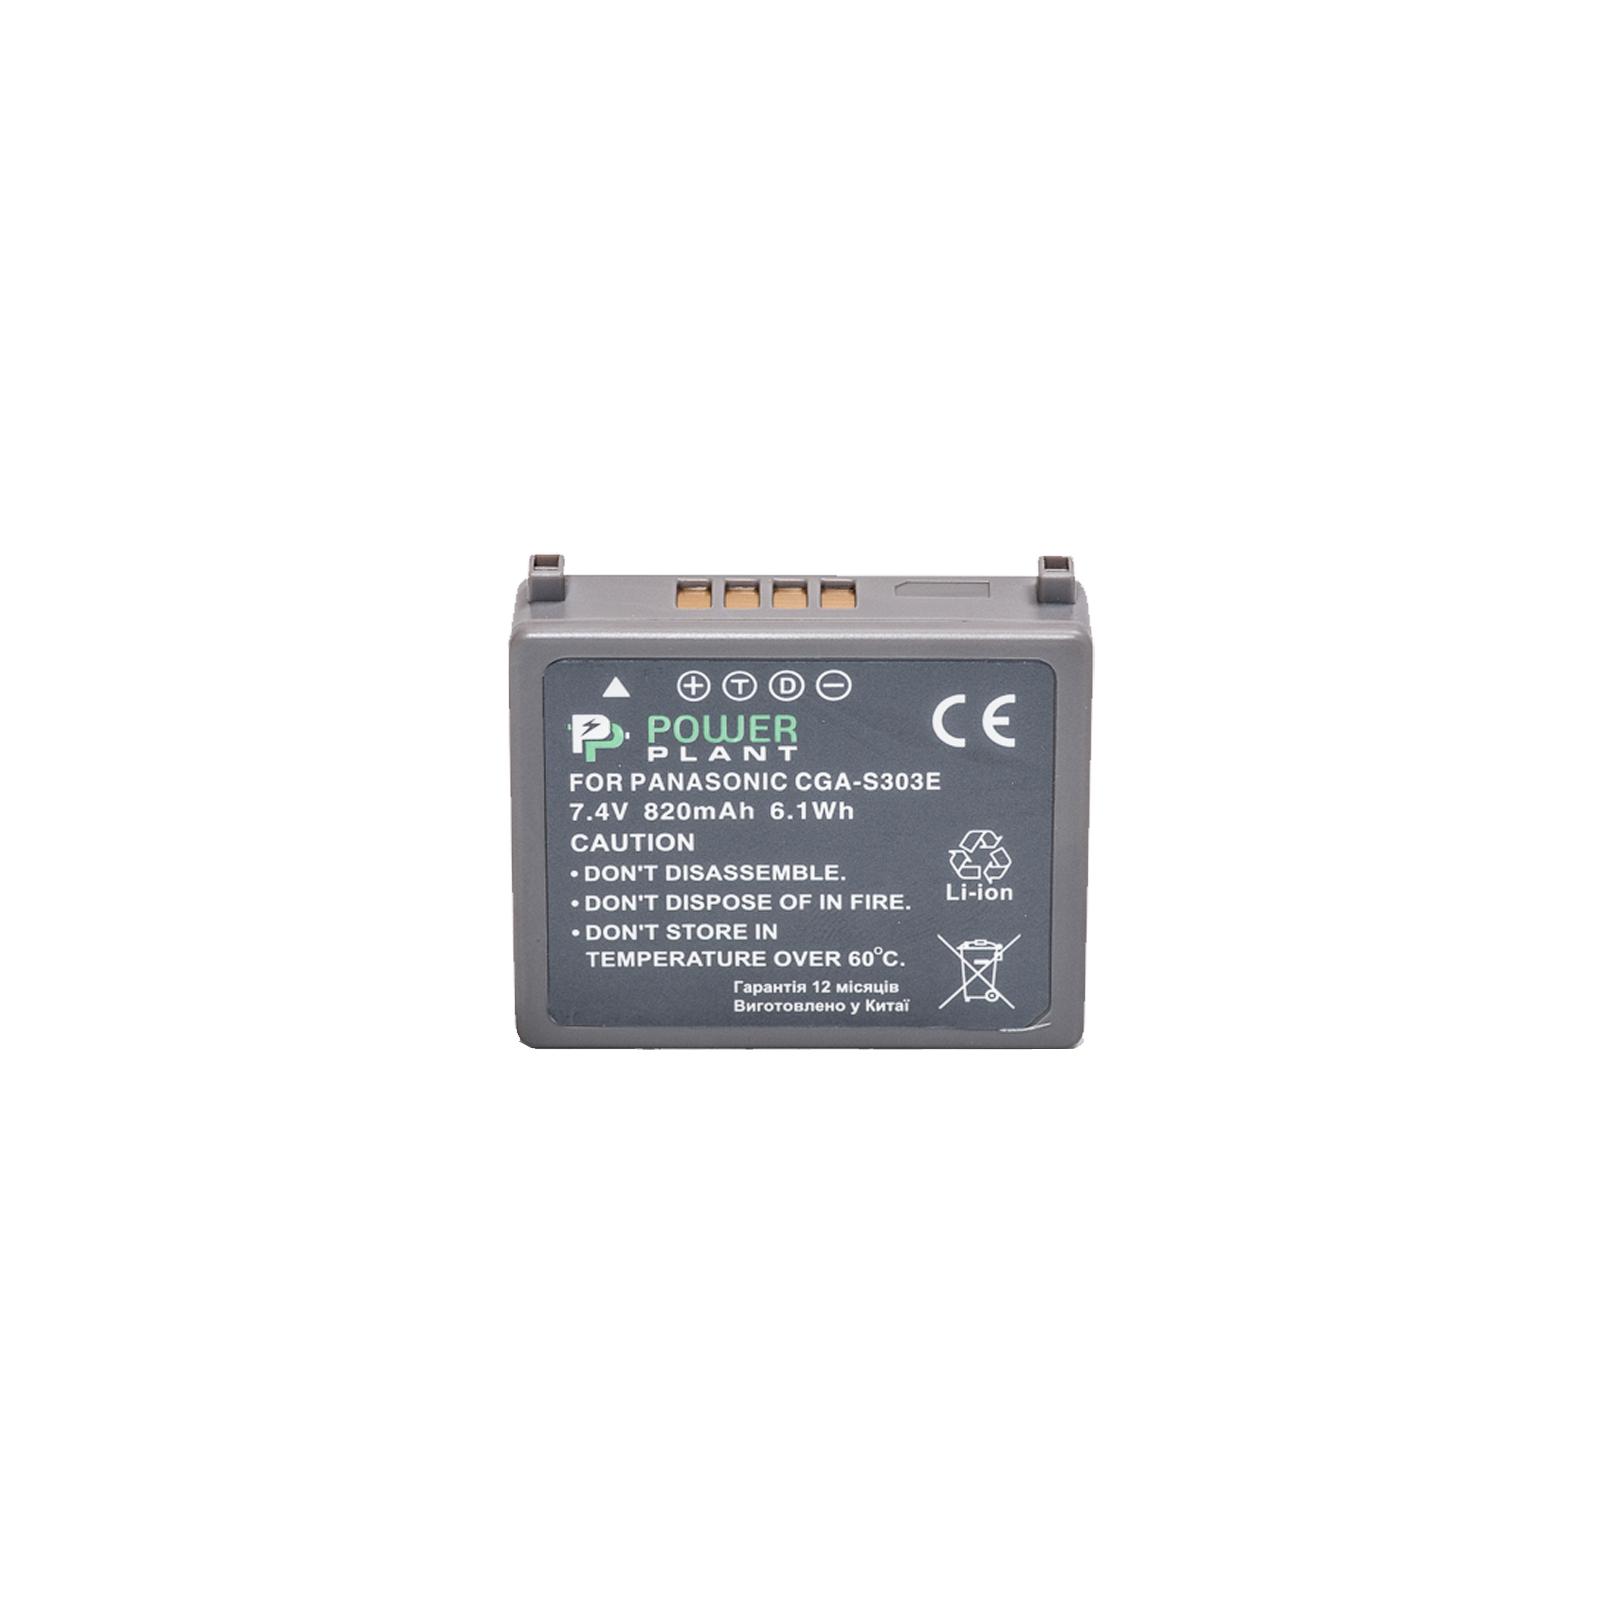 Аккумулятор к фото/видео PowerPlant Panasonic VW-VBE10, CGA-S303 (DV00DV1341)